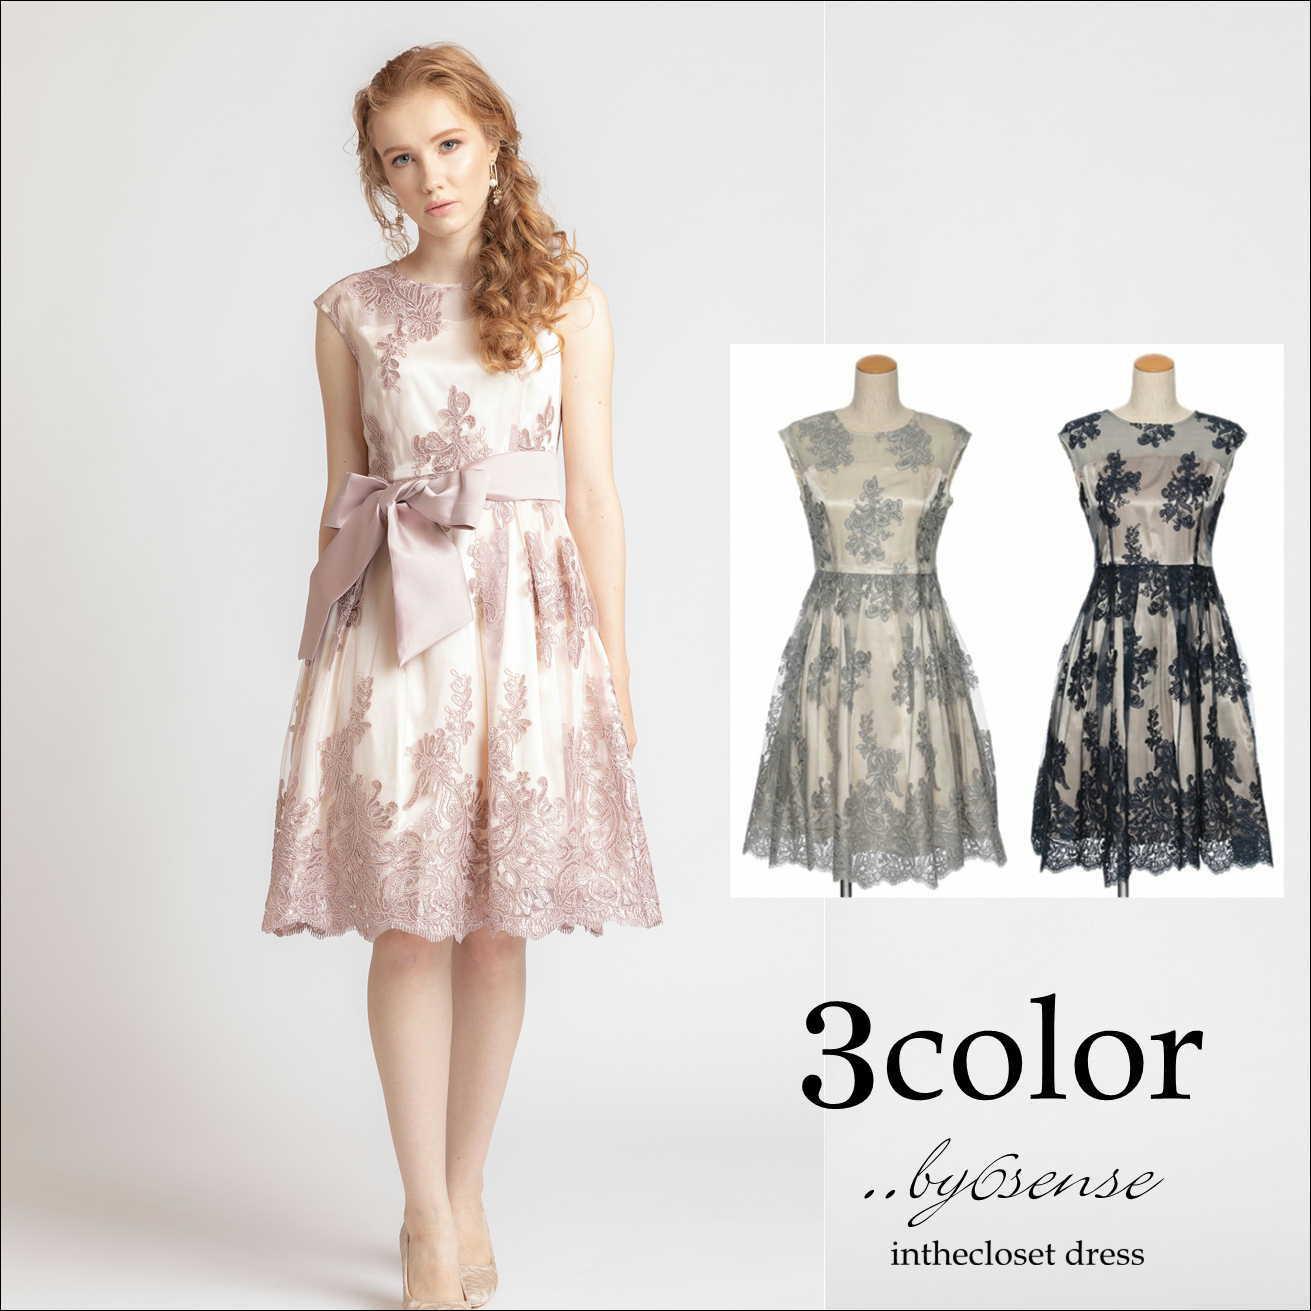 3color DorryDoll 花柄刺繍入りサッシュベルト付きチュールレースドレス